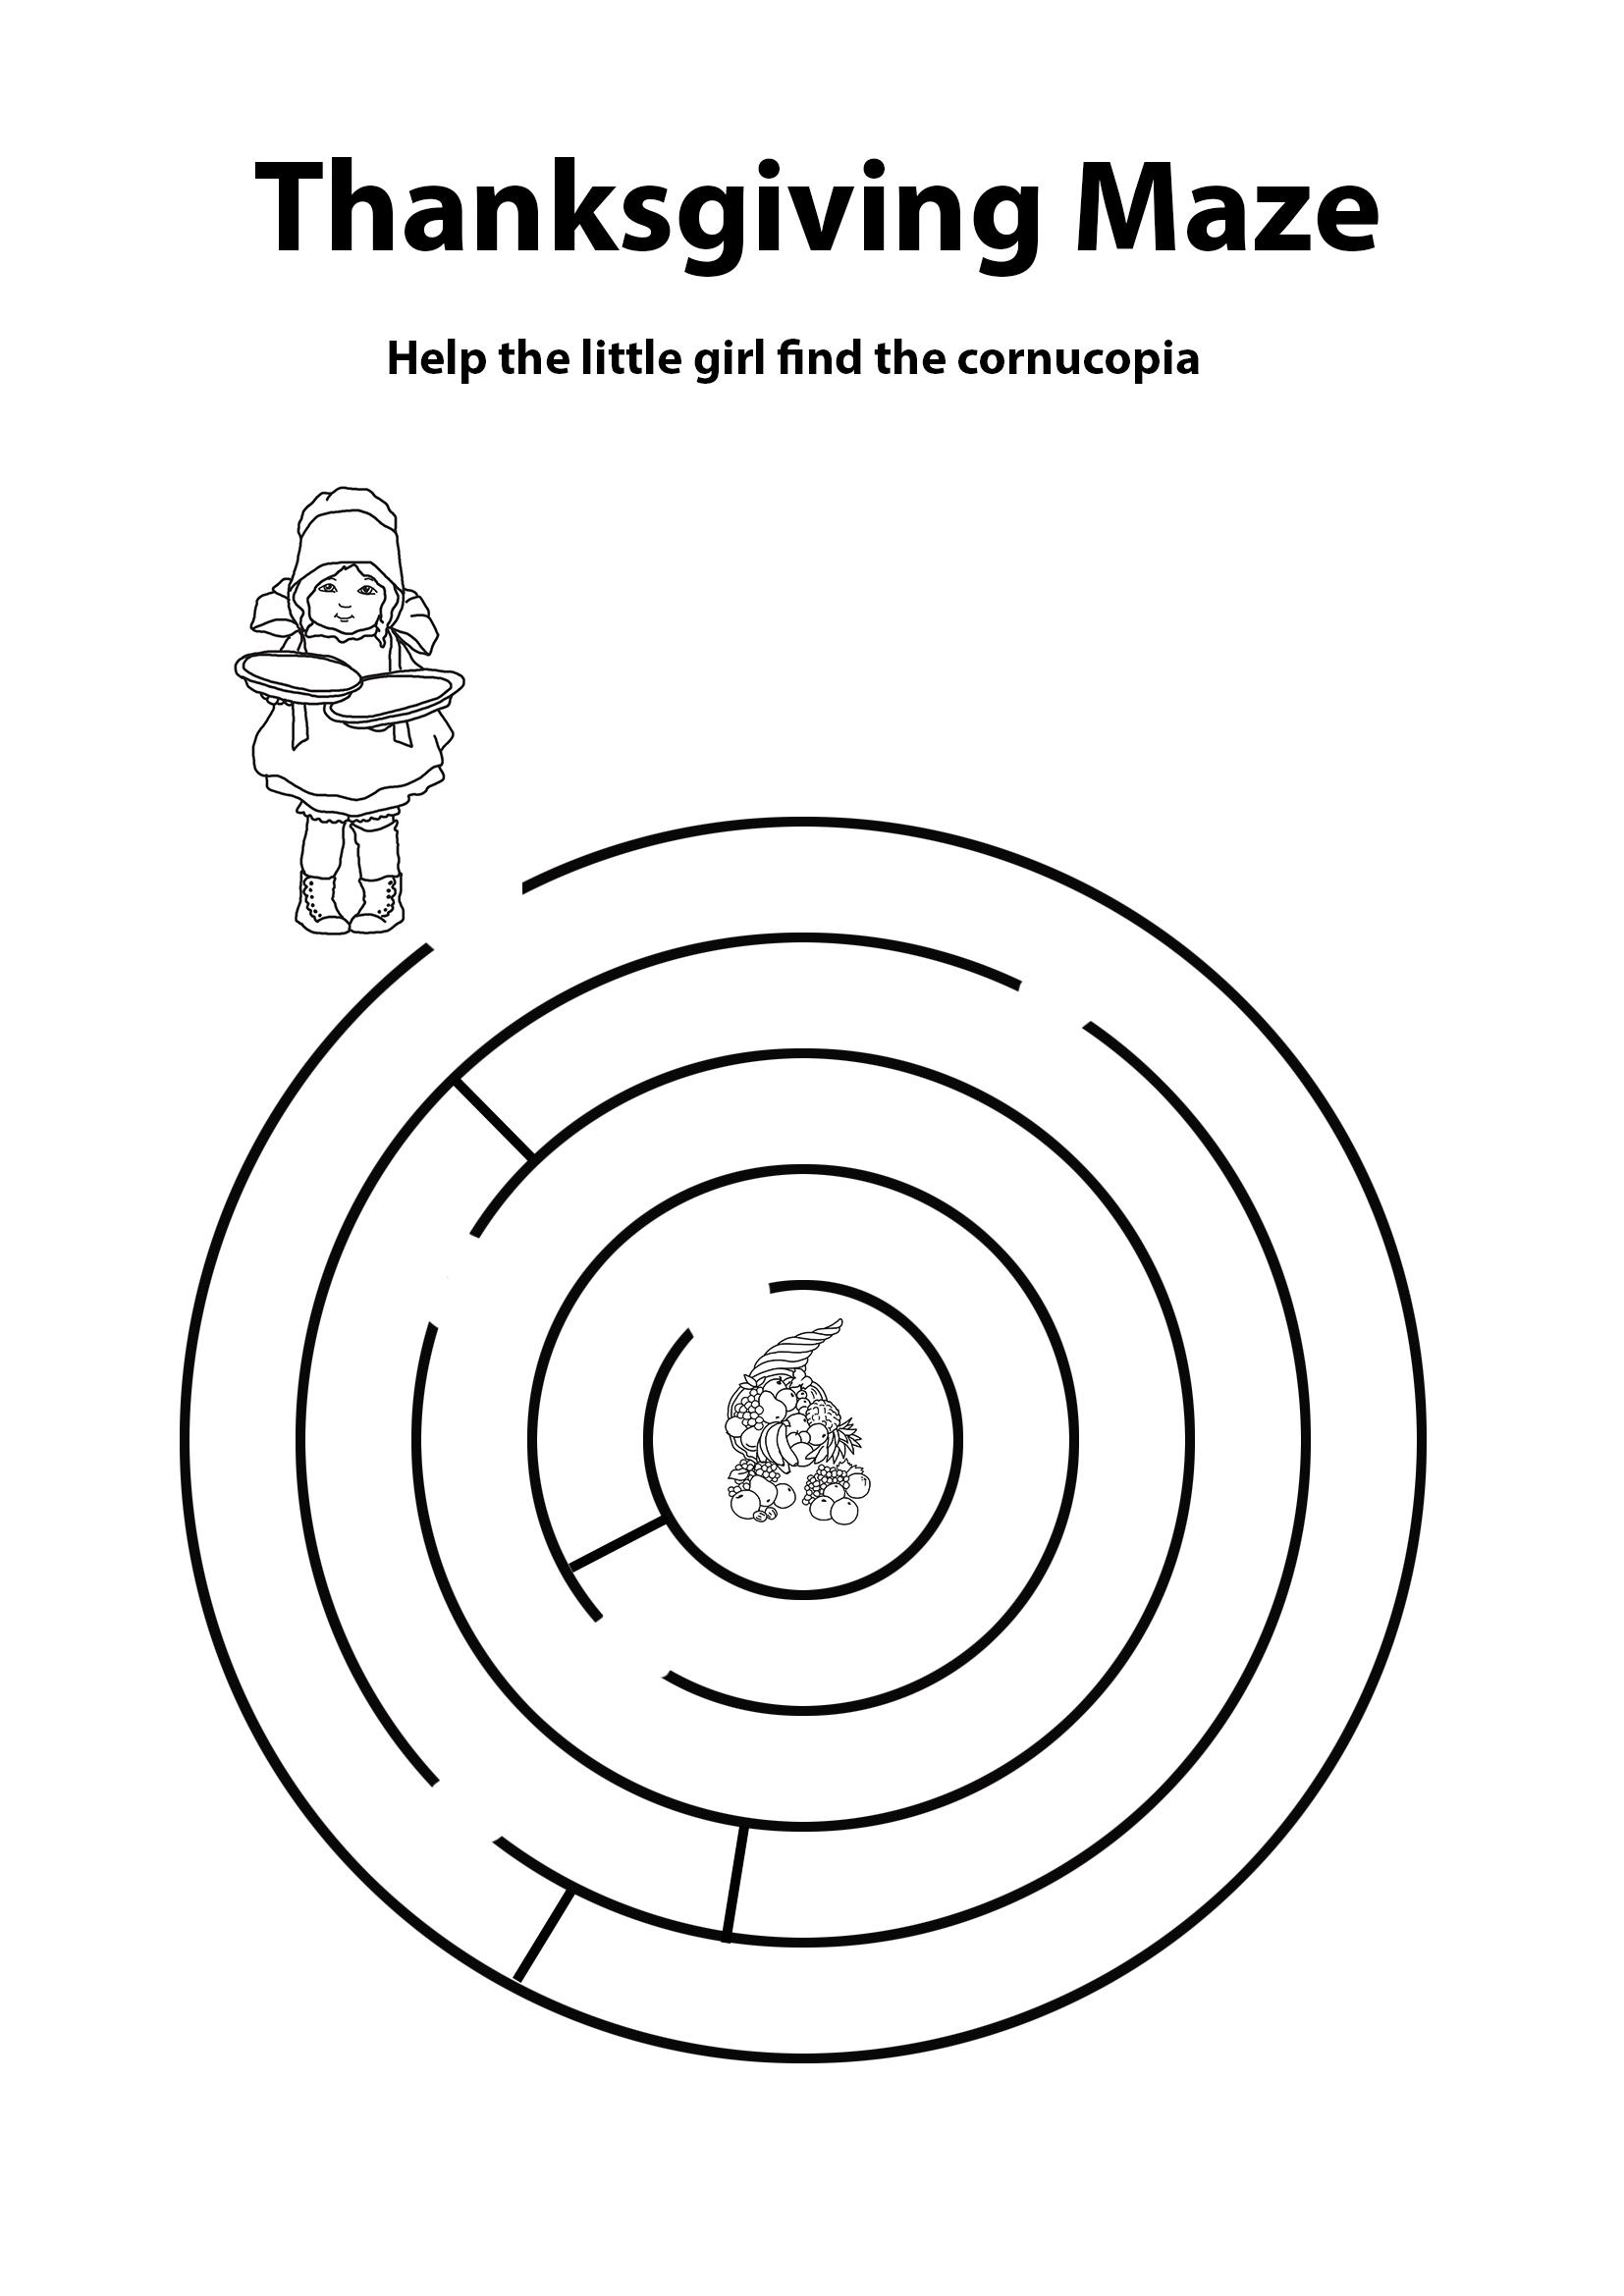 Thanksgiving mazes with girl and cornucopia